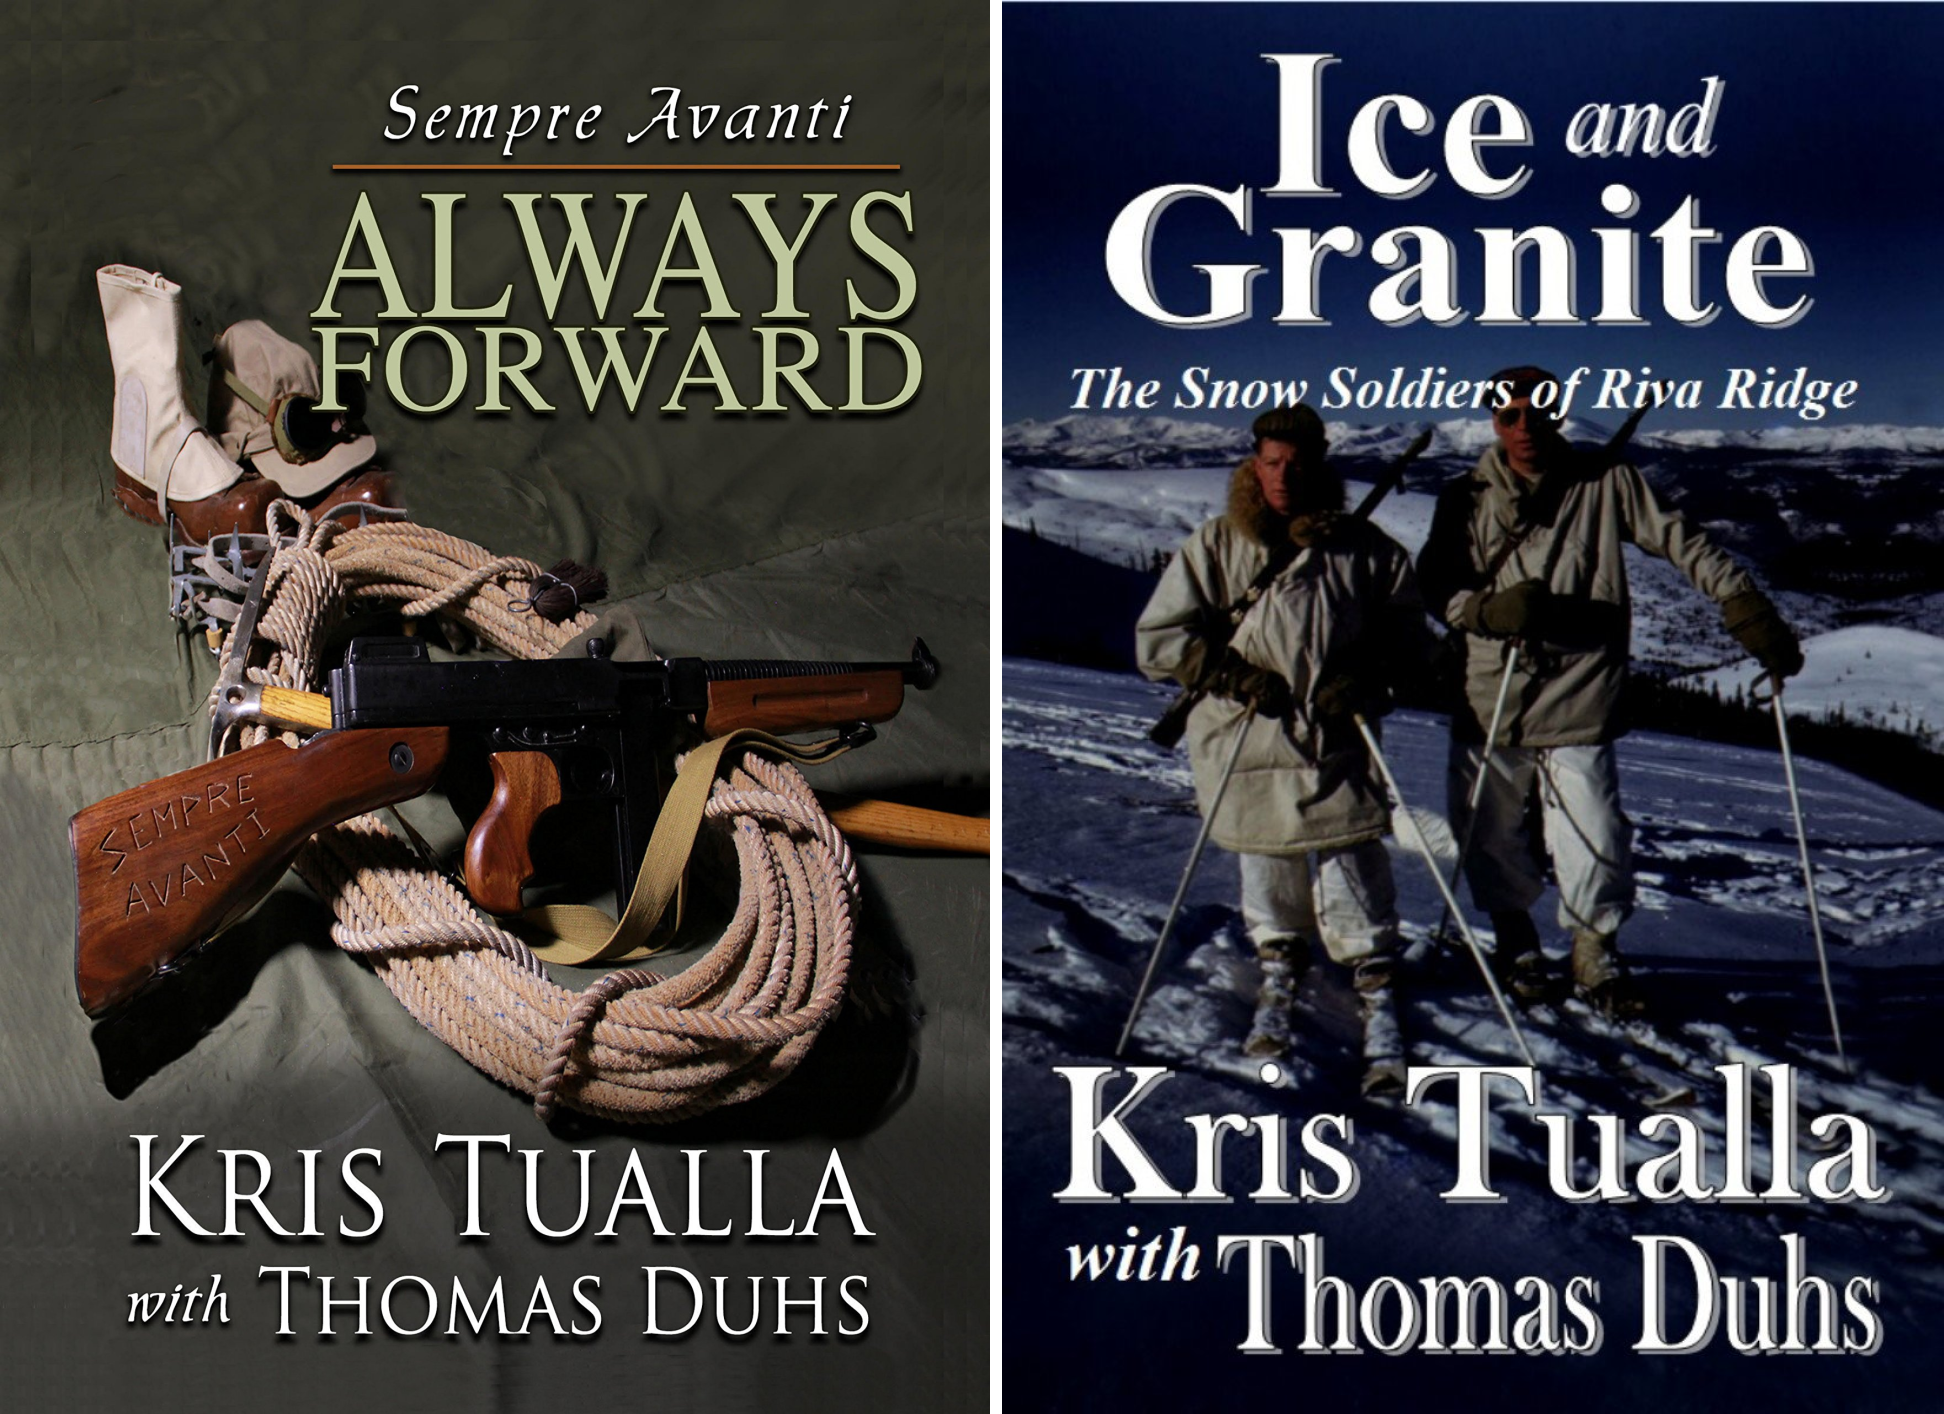 Duh Series - The Camp Hale Series (2 Book Series)